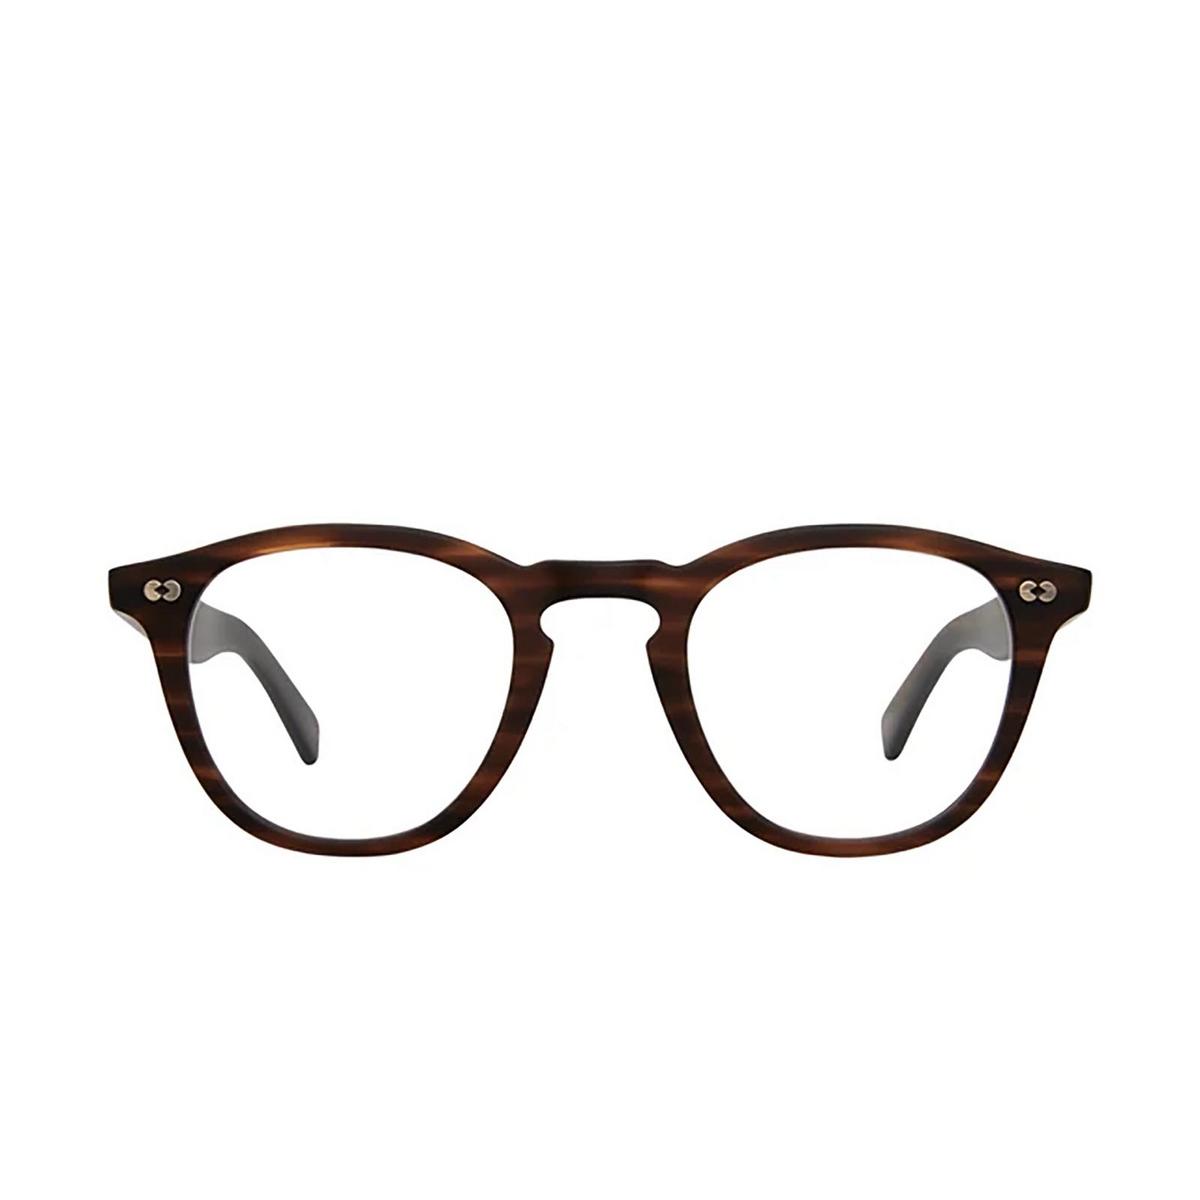 Garrett Leight® Square Eyeglasses: Hampton X color Matte Brandy Tort Mbrt - front view.